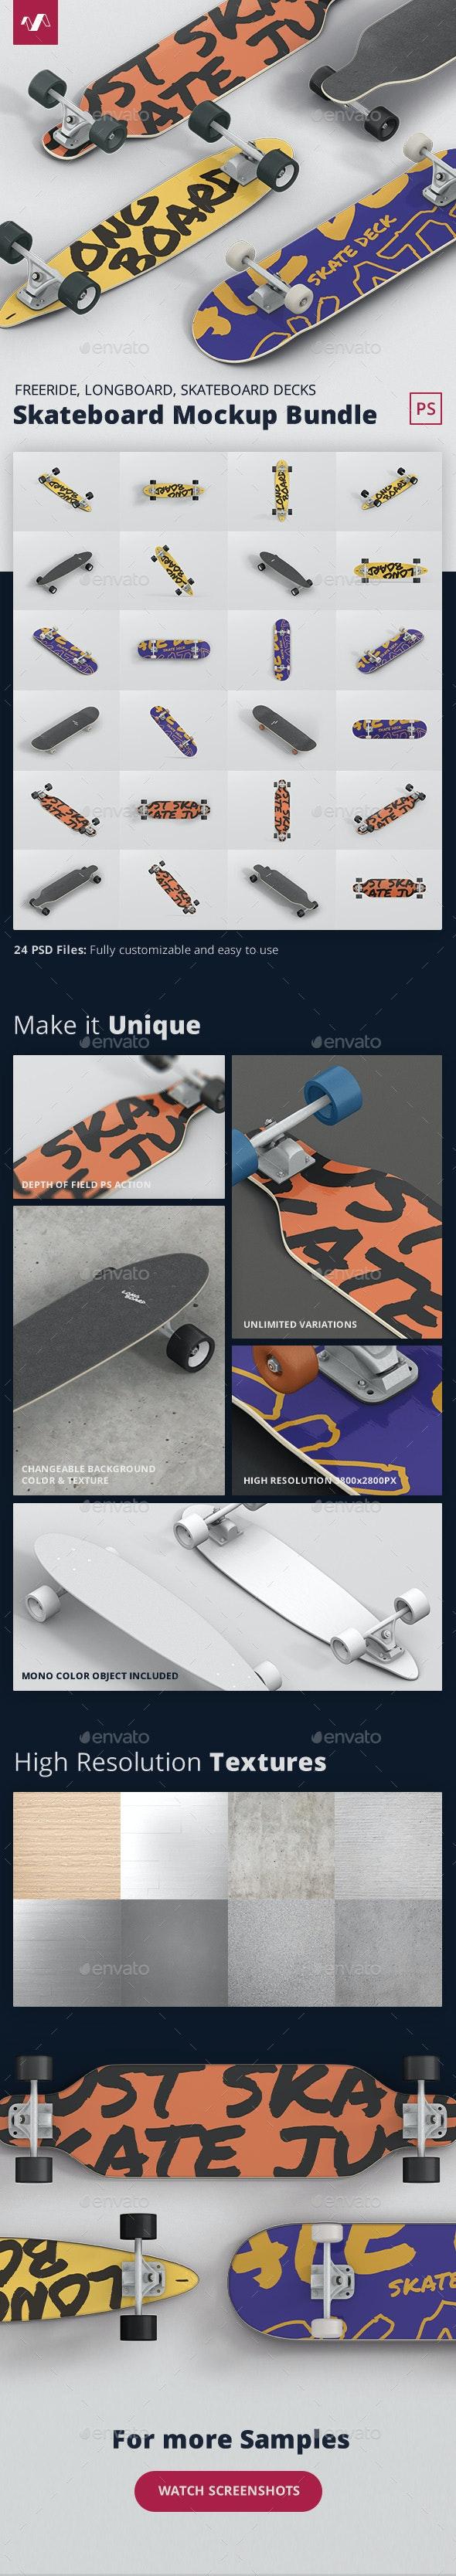 Longboard Skateboard Mockup Bundle - Miscellaneous Product Mock-Ups